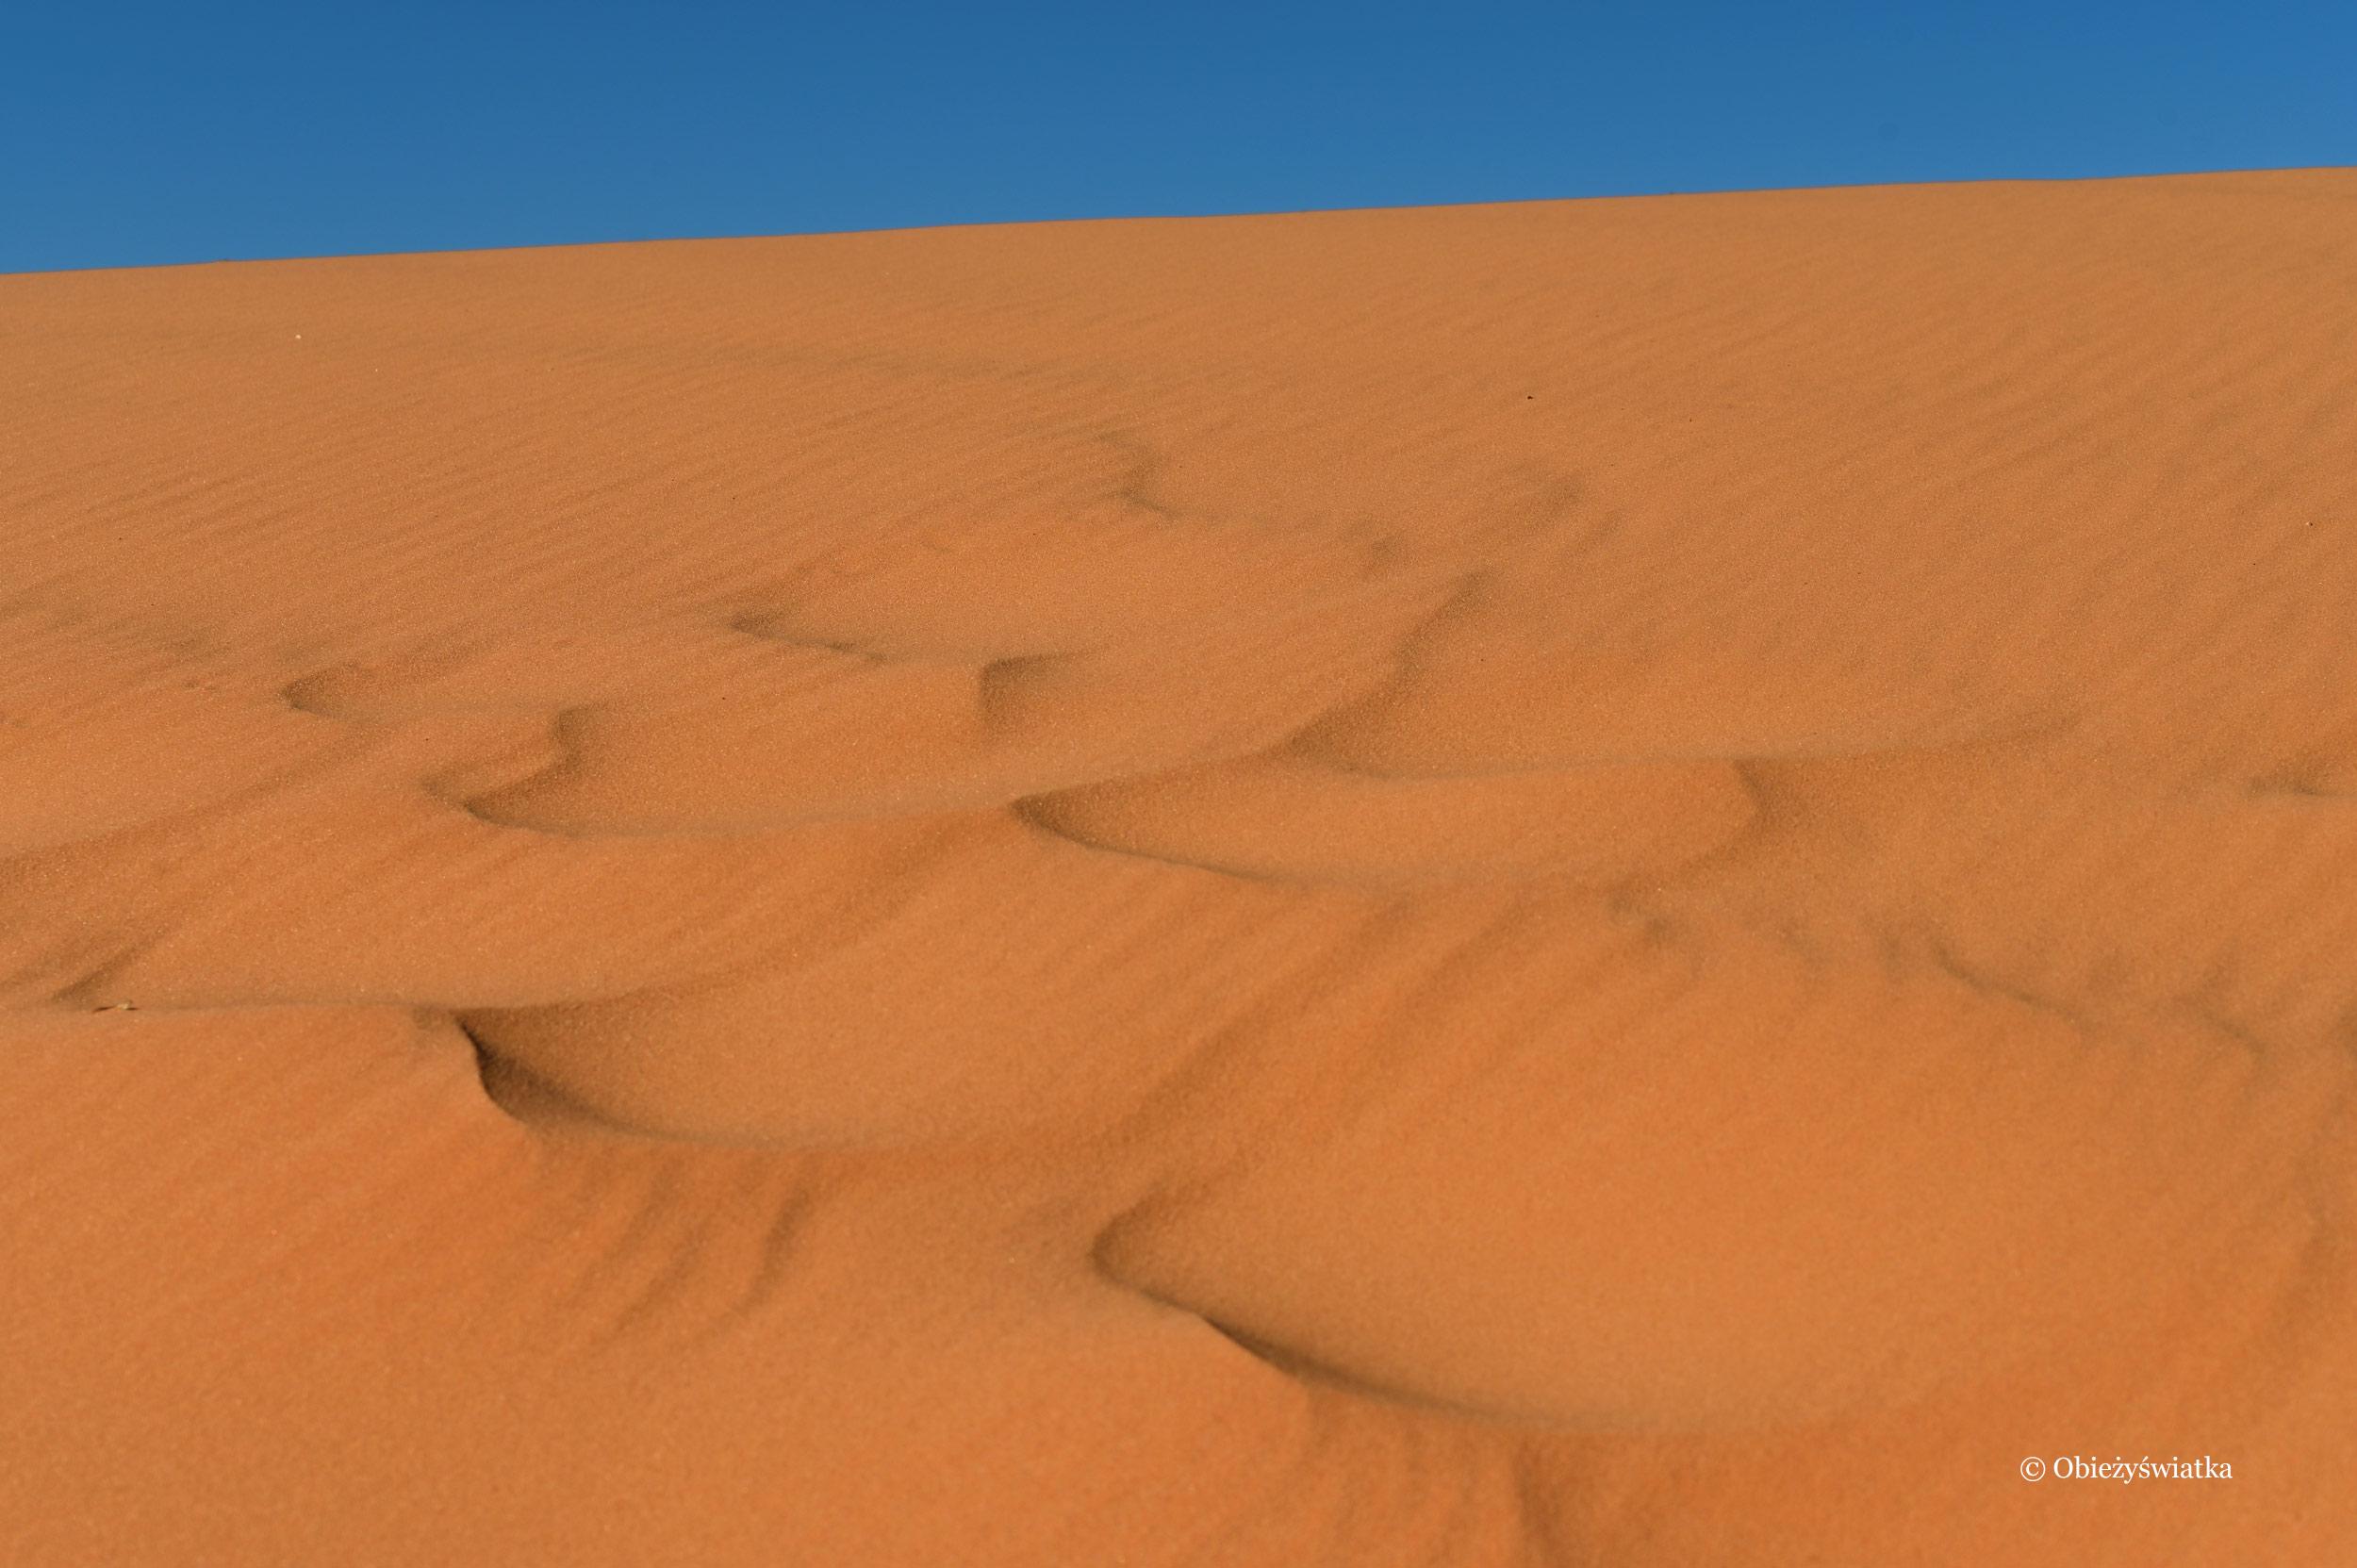 Mocno niebieskie niebo i pomarańczowy piasek wydm, Coral Pink Sand Dunes State Park, Utah